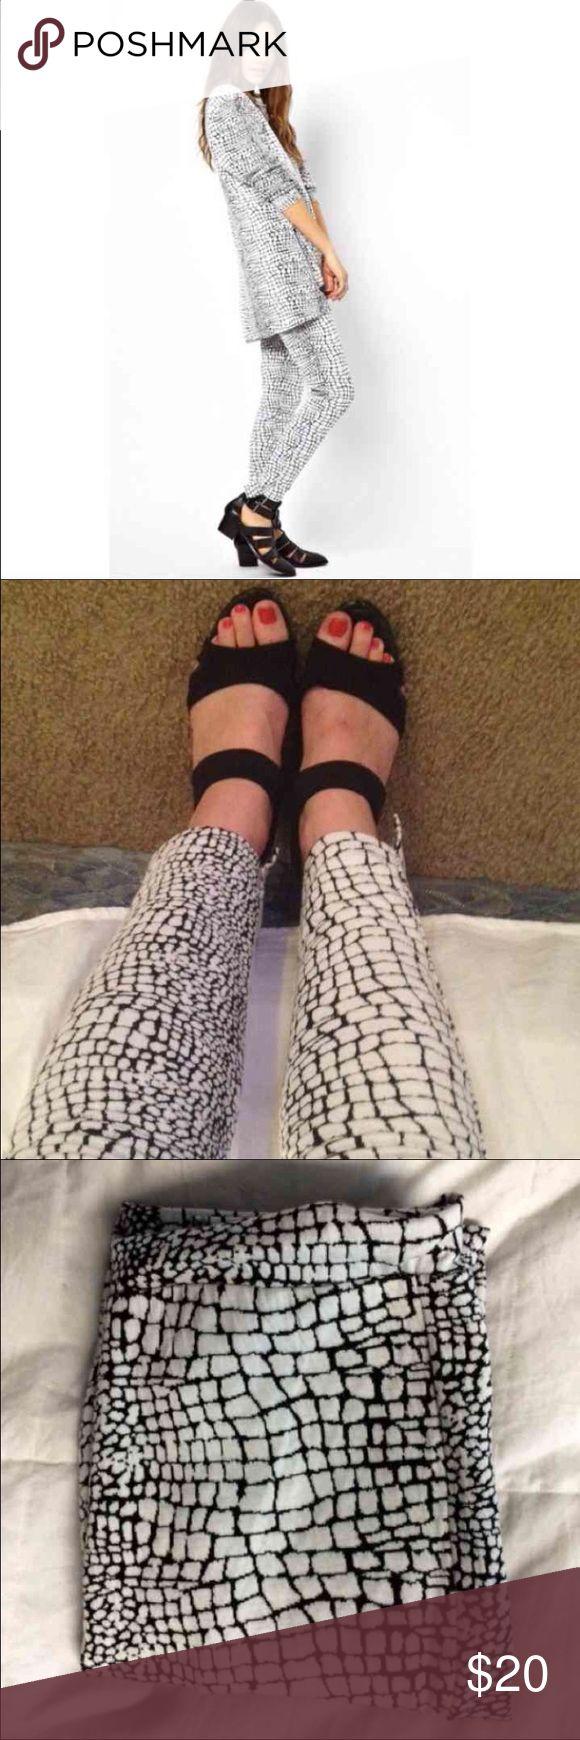 ASOS snake print pants NWOT, black and white snake print, very comfy. ASOS Pants Ankle & Cropped